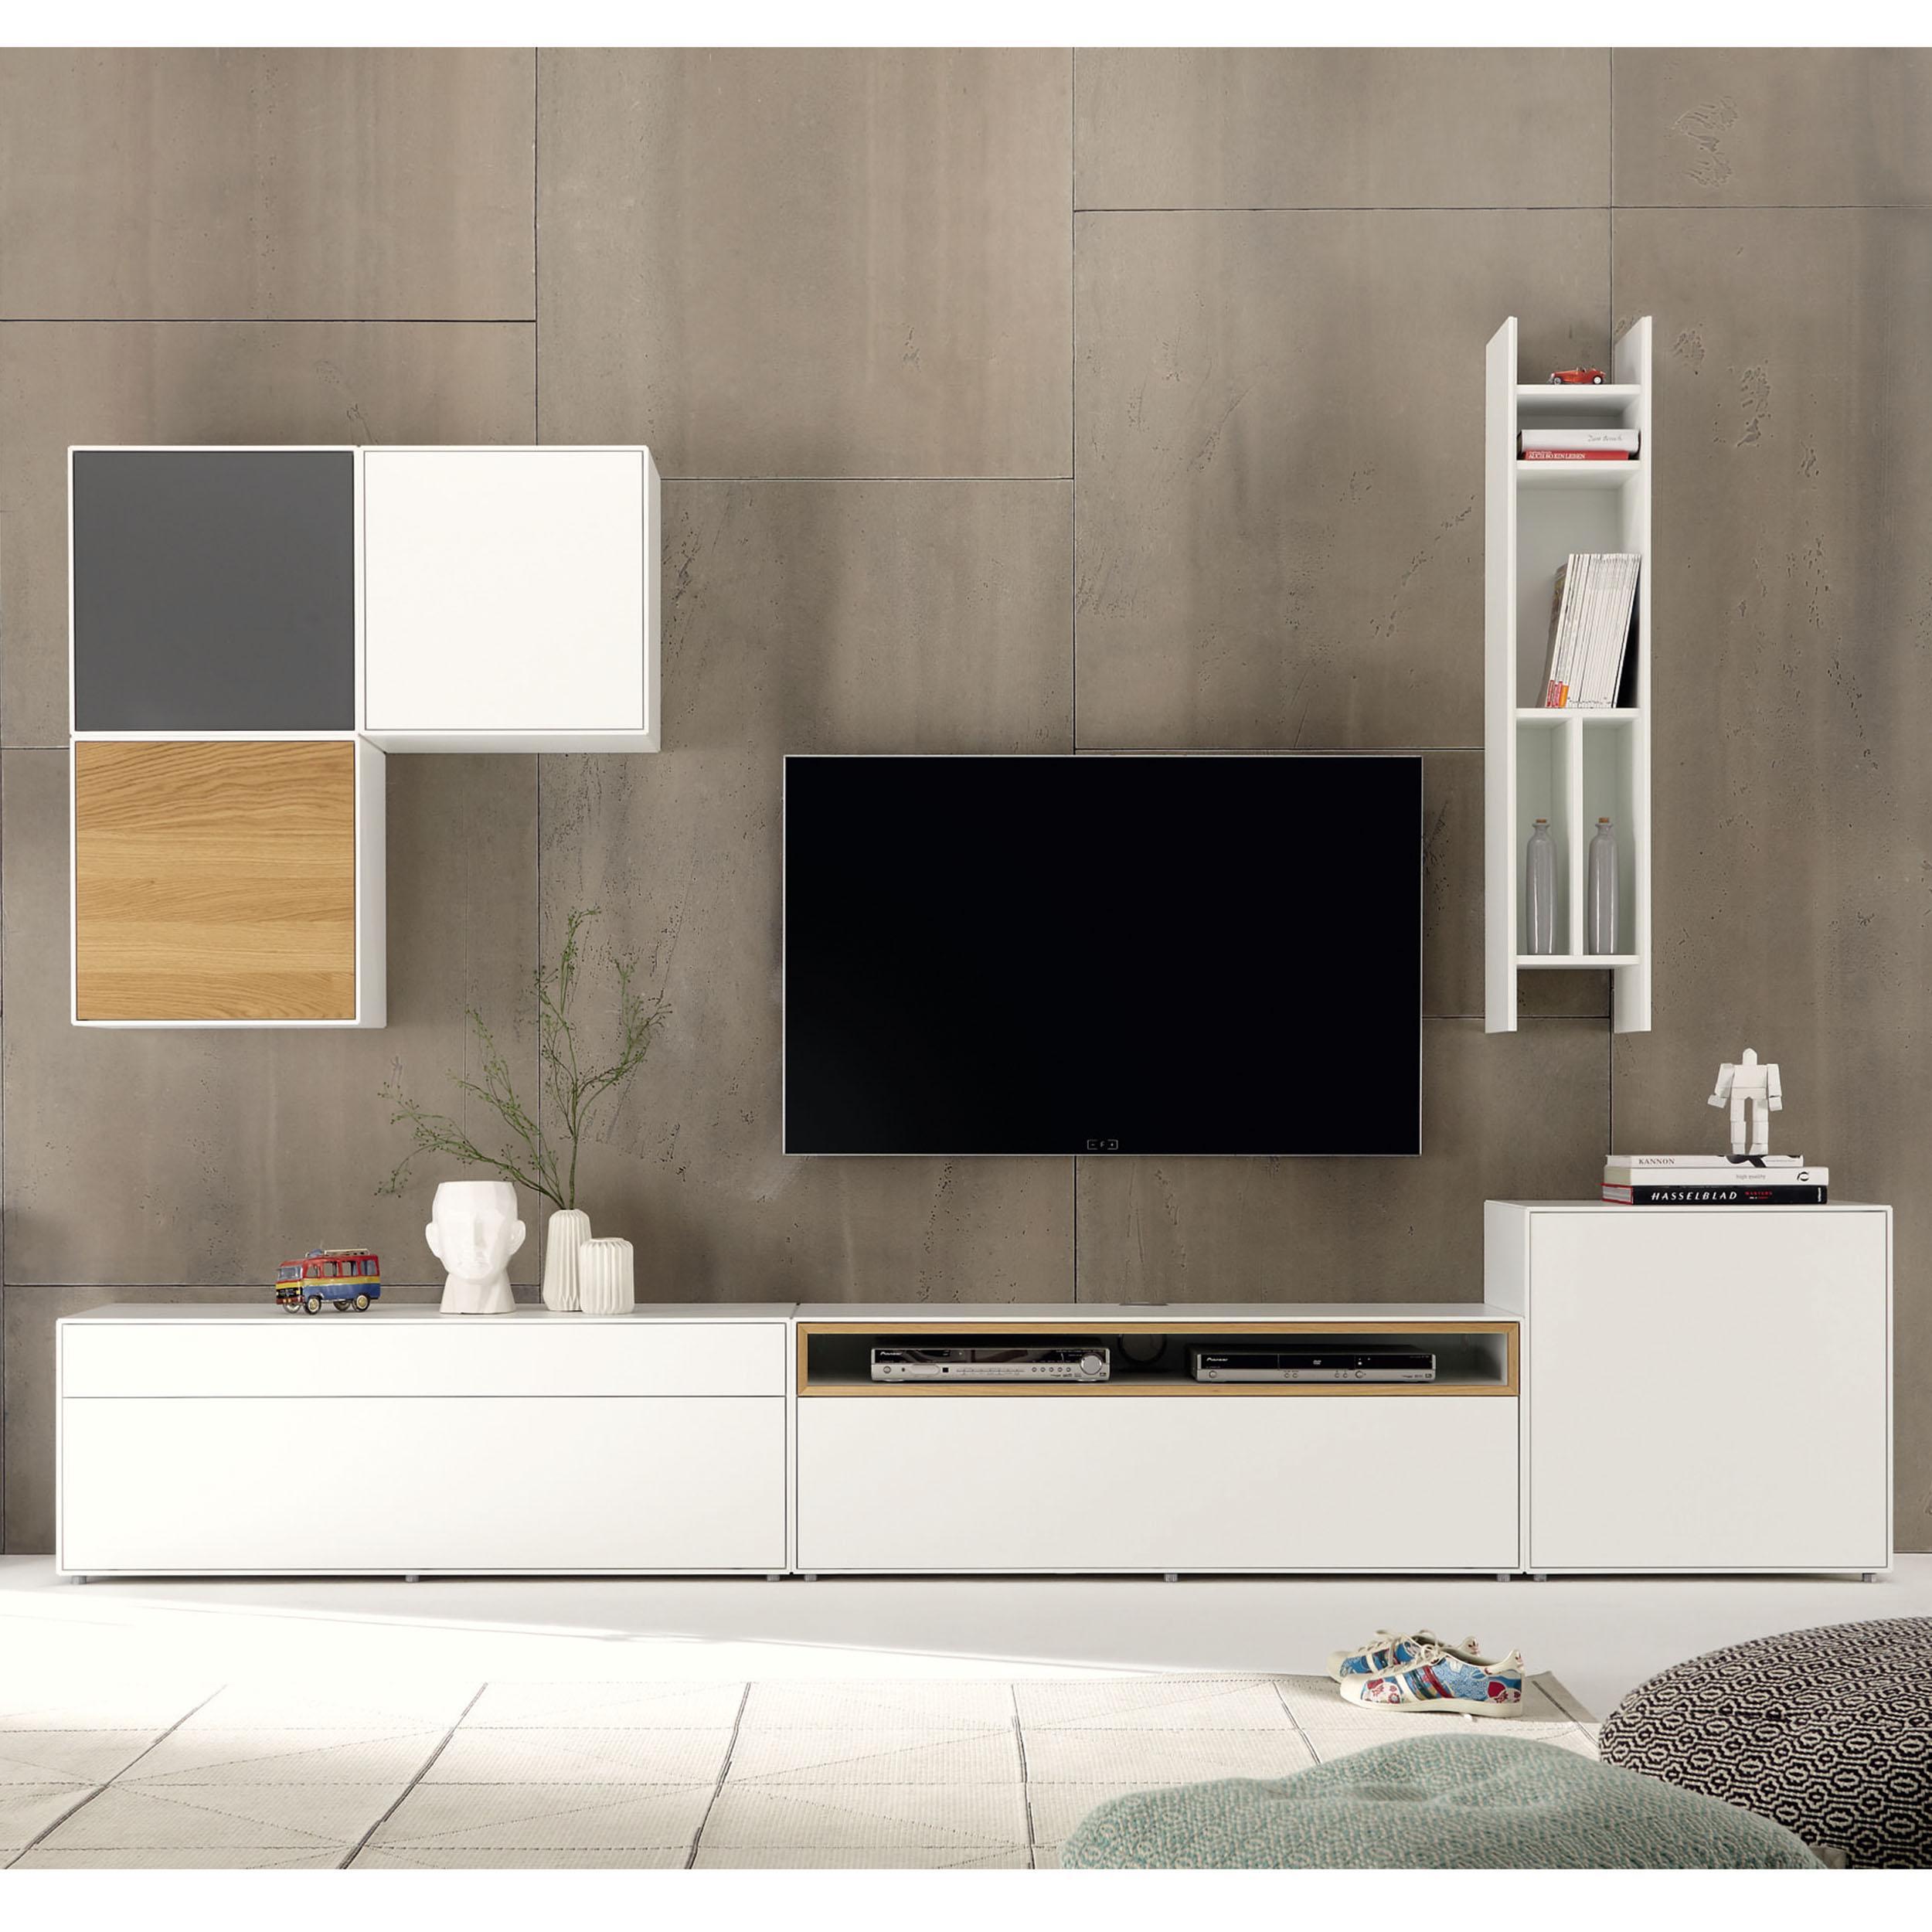 wandregal seite 3 bilder ideen couchstyle. Black Bedroom Furniture Sets. Home Design Ideas